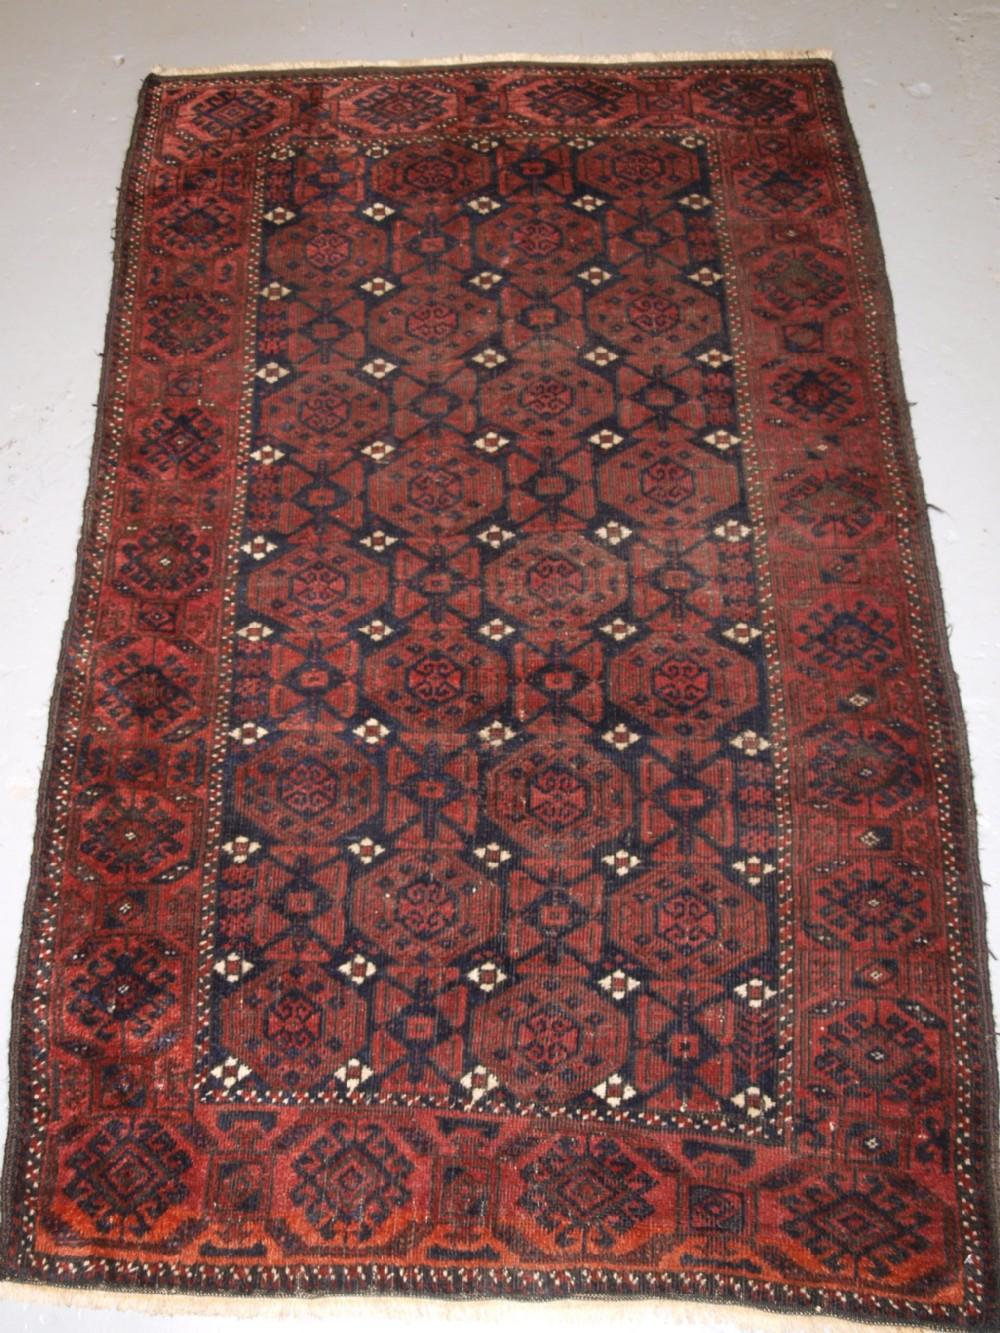 antique baluch rug with repeat lattice design white flowers circa 1900